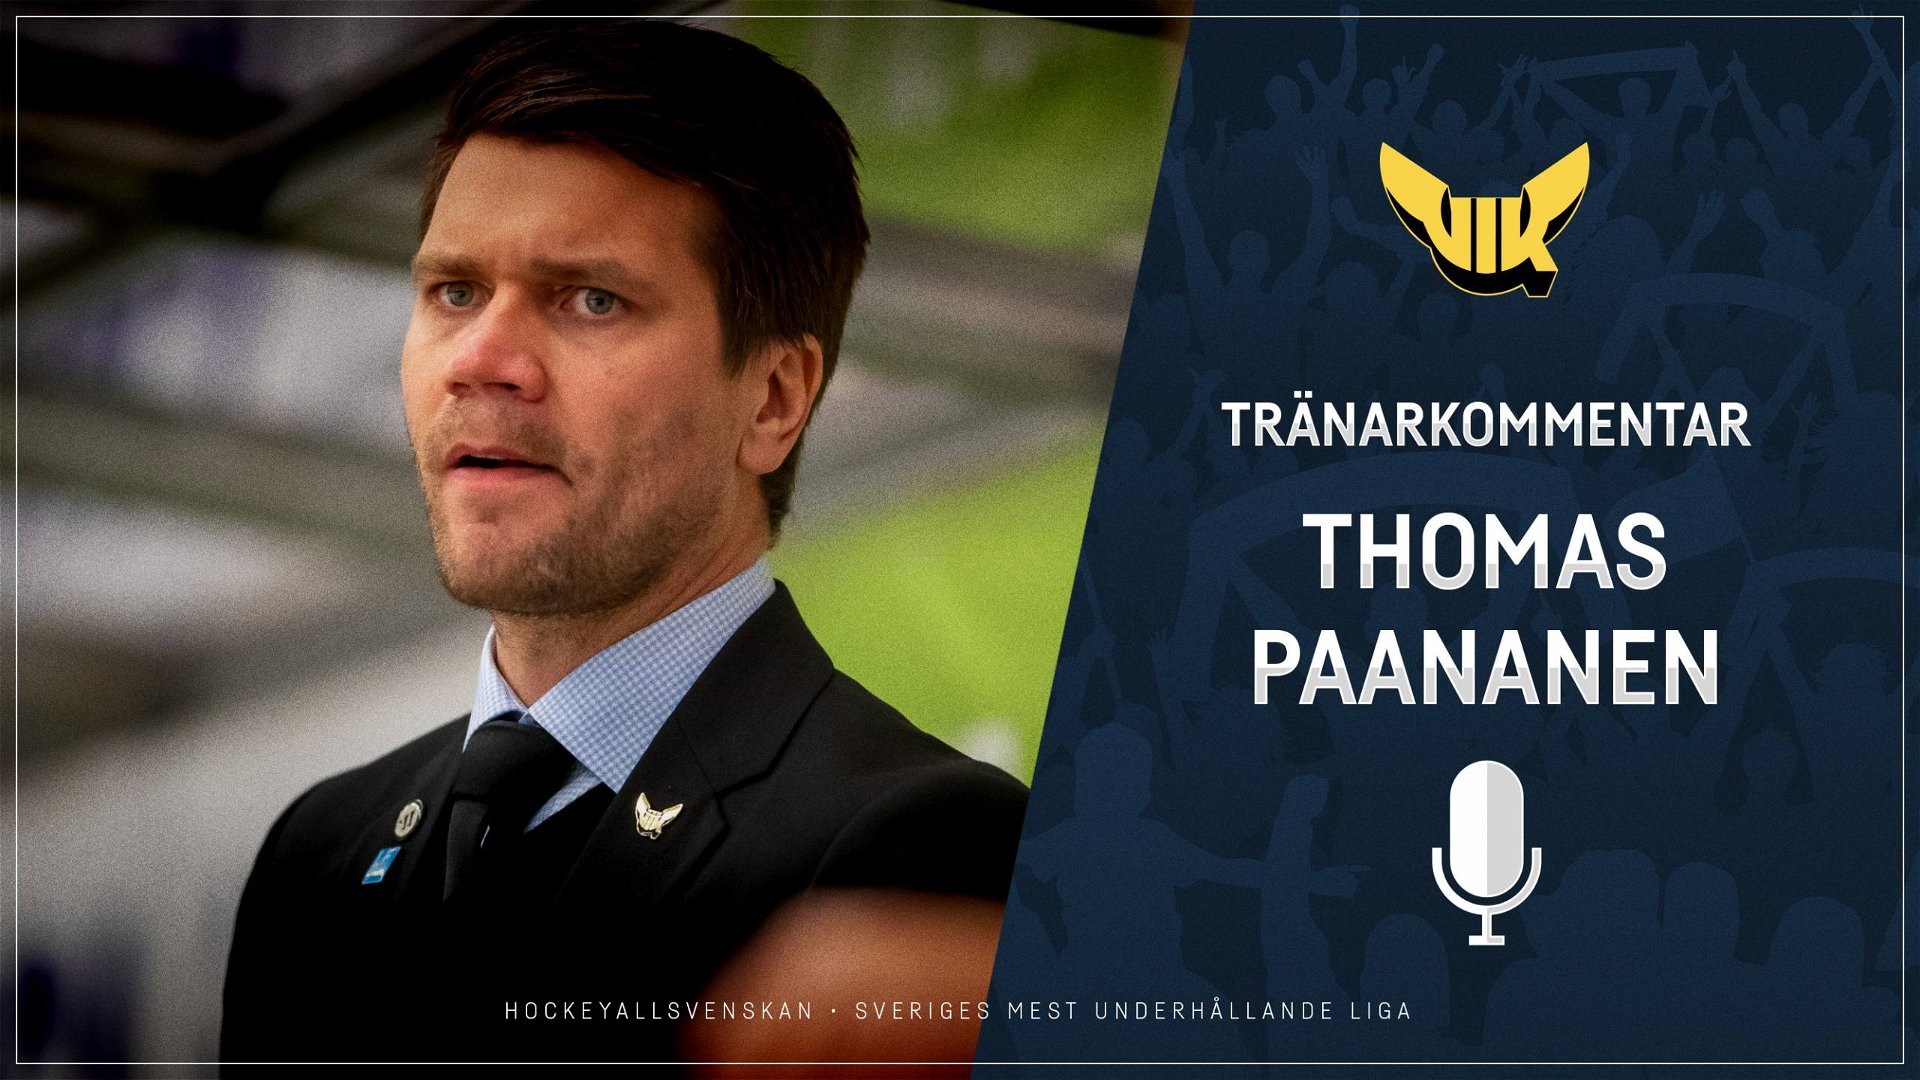 2021-03-12 Segerintervju: Thomas Paananen